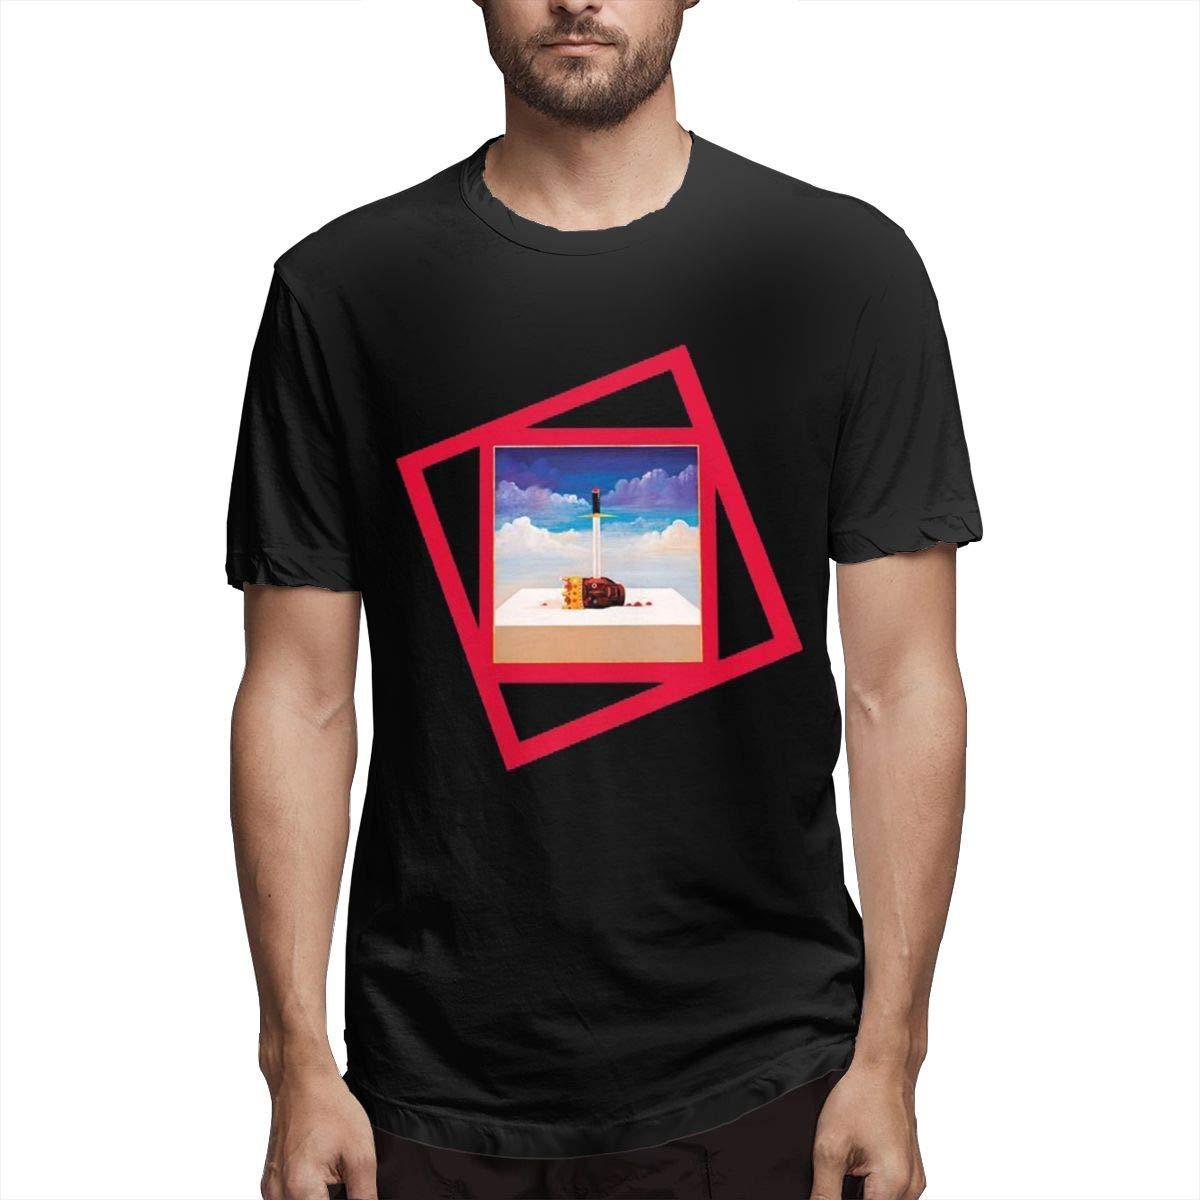 Gladyswatchman S Kanye West My Dark Twisted Fantasy Cool Ts Shirts